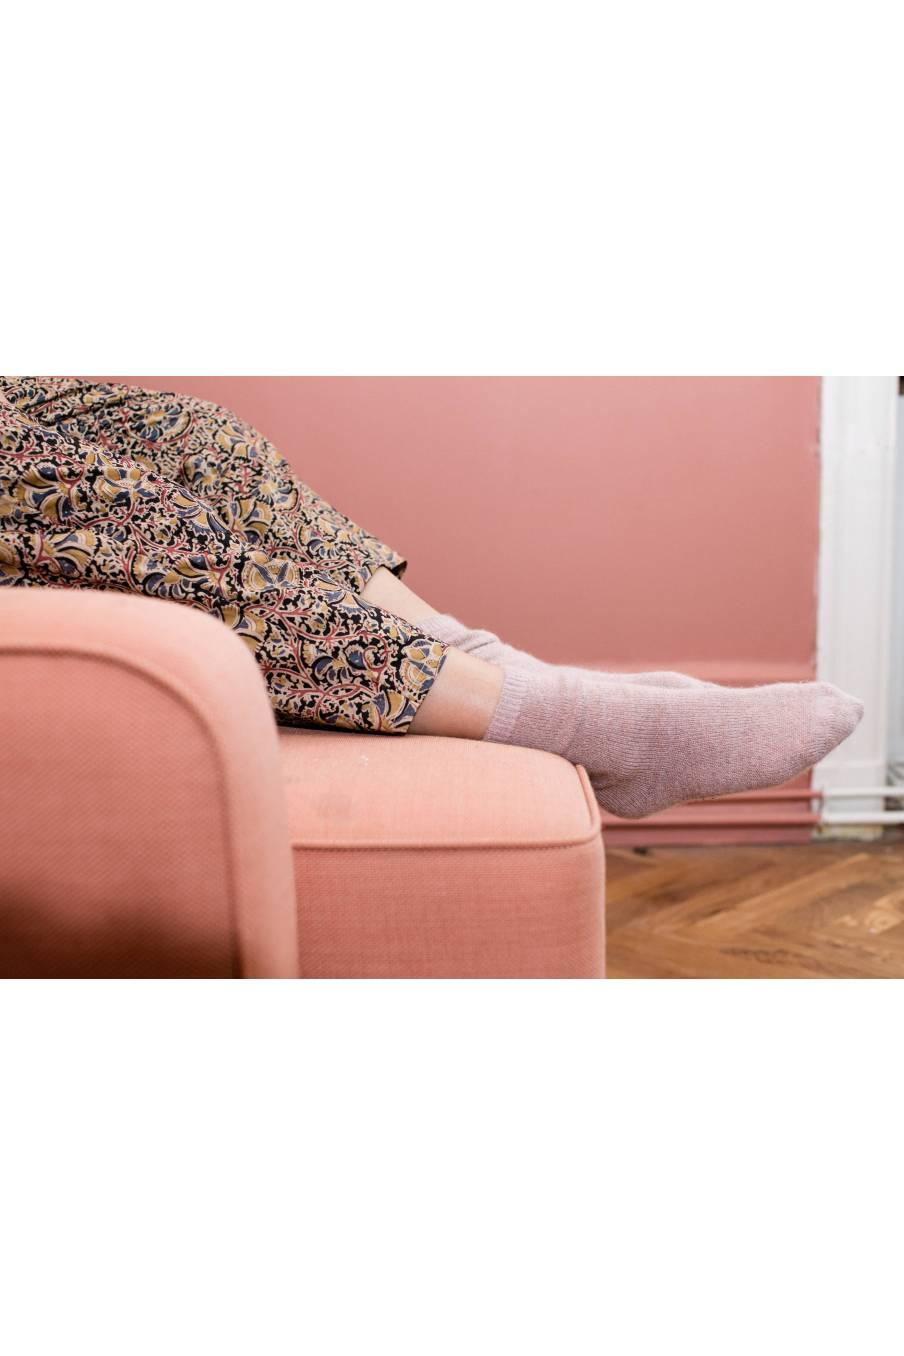 boheme chic vintage pantalon femme olenia nordish flowers